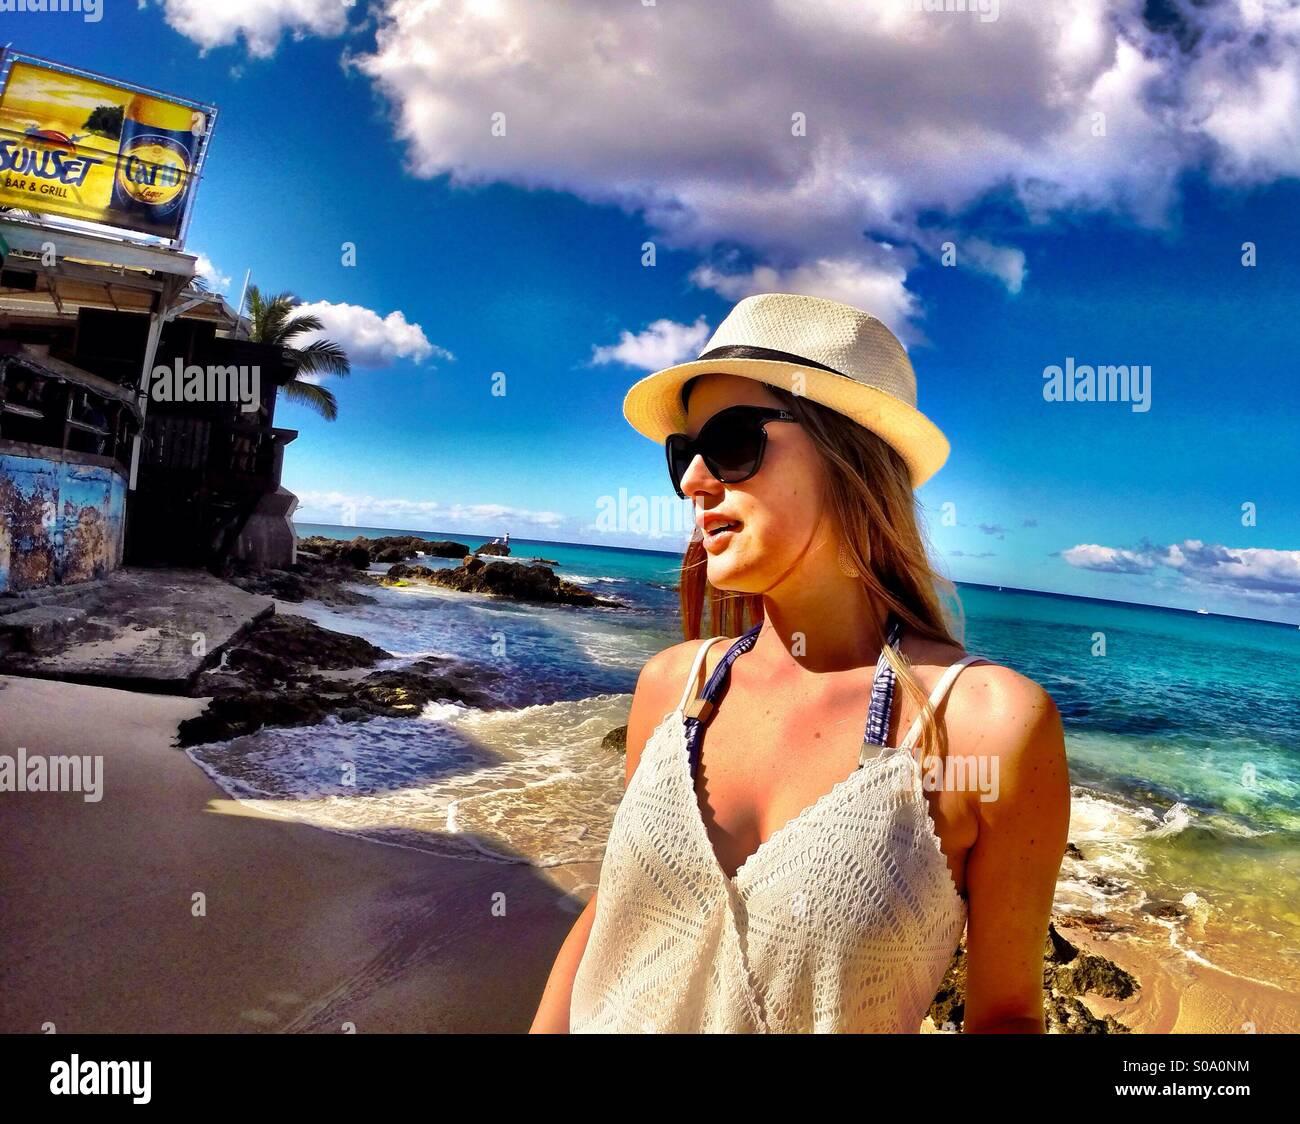 Lo stile di vita dei Caraibi, Saint Maarten isole - moda , rilassante, blu oceano Immagini Stock